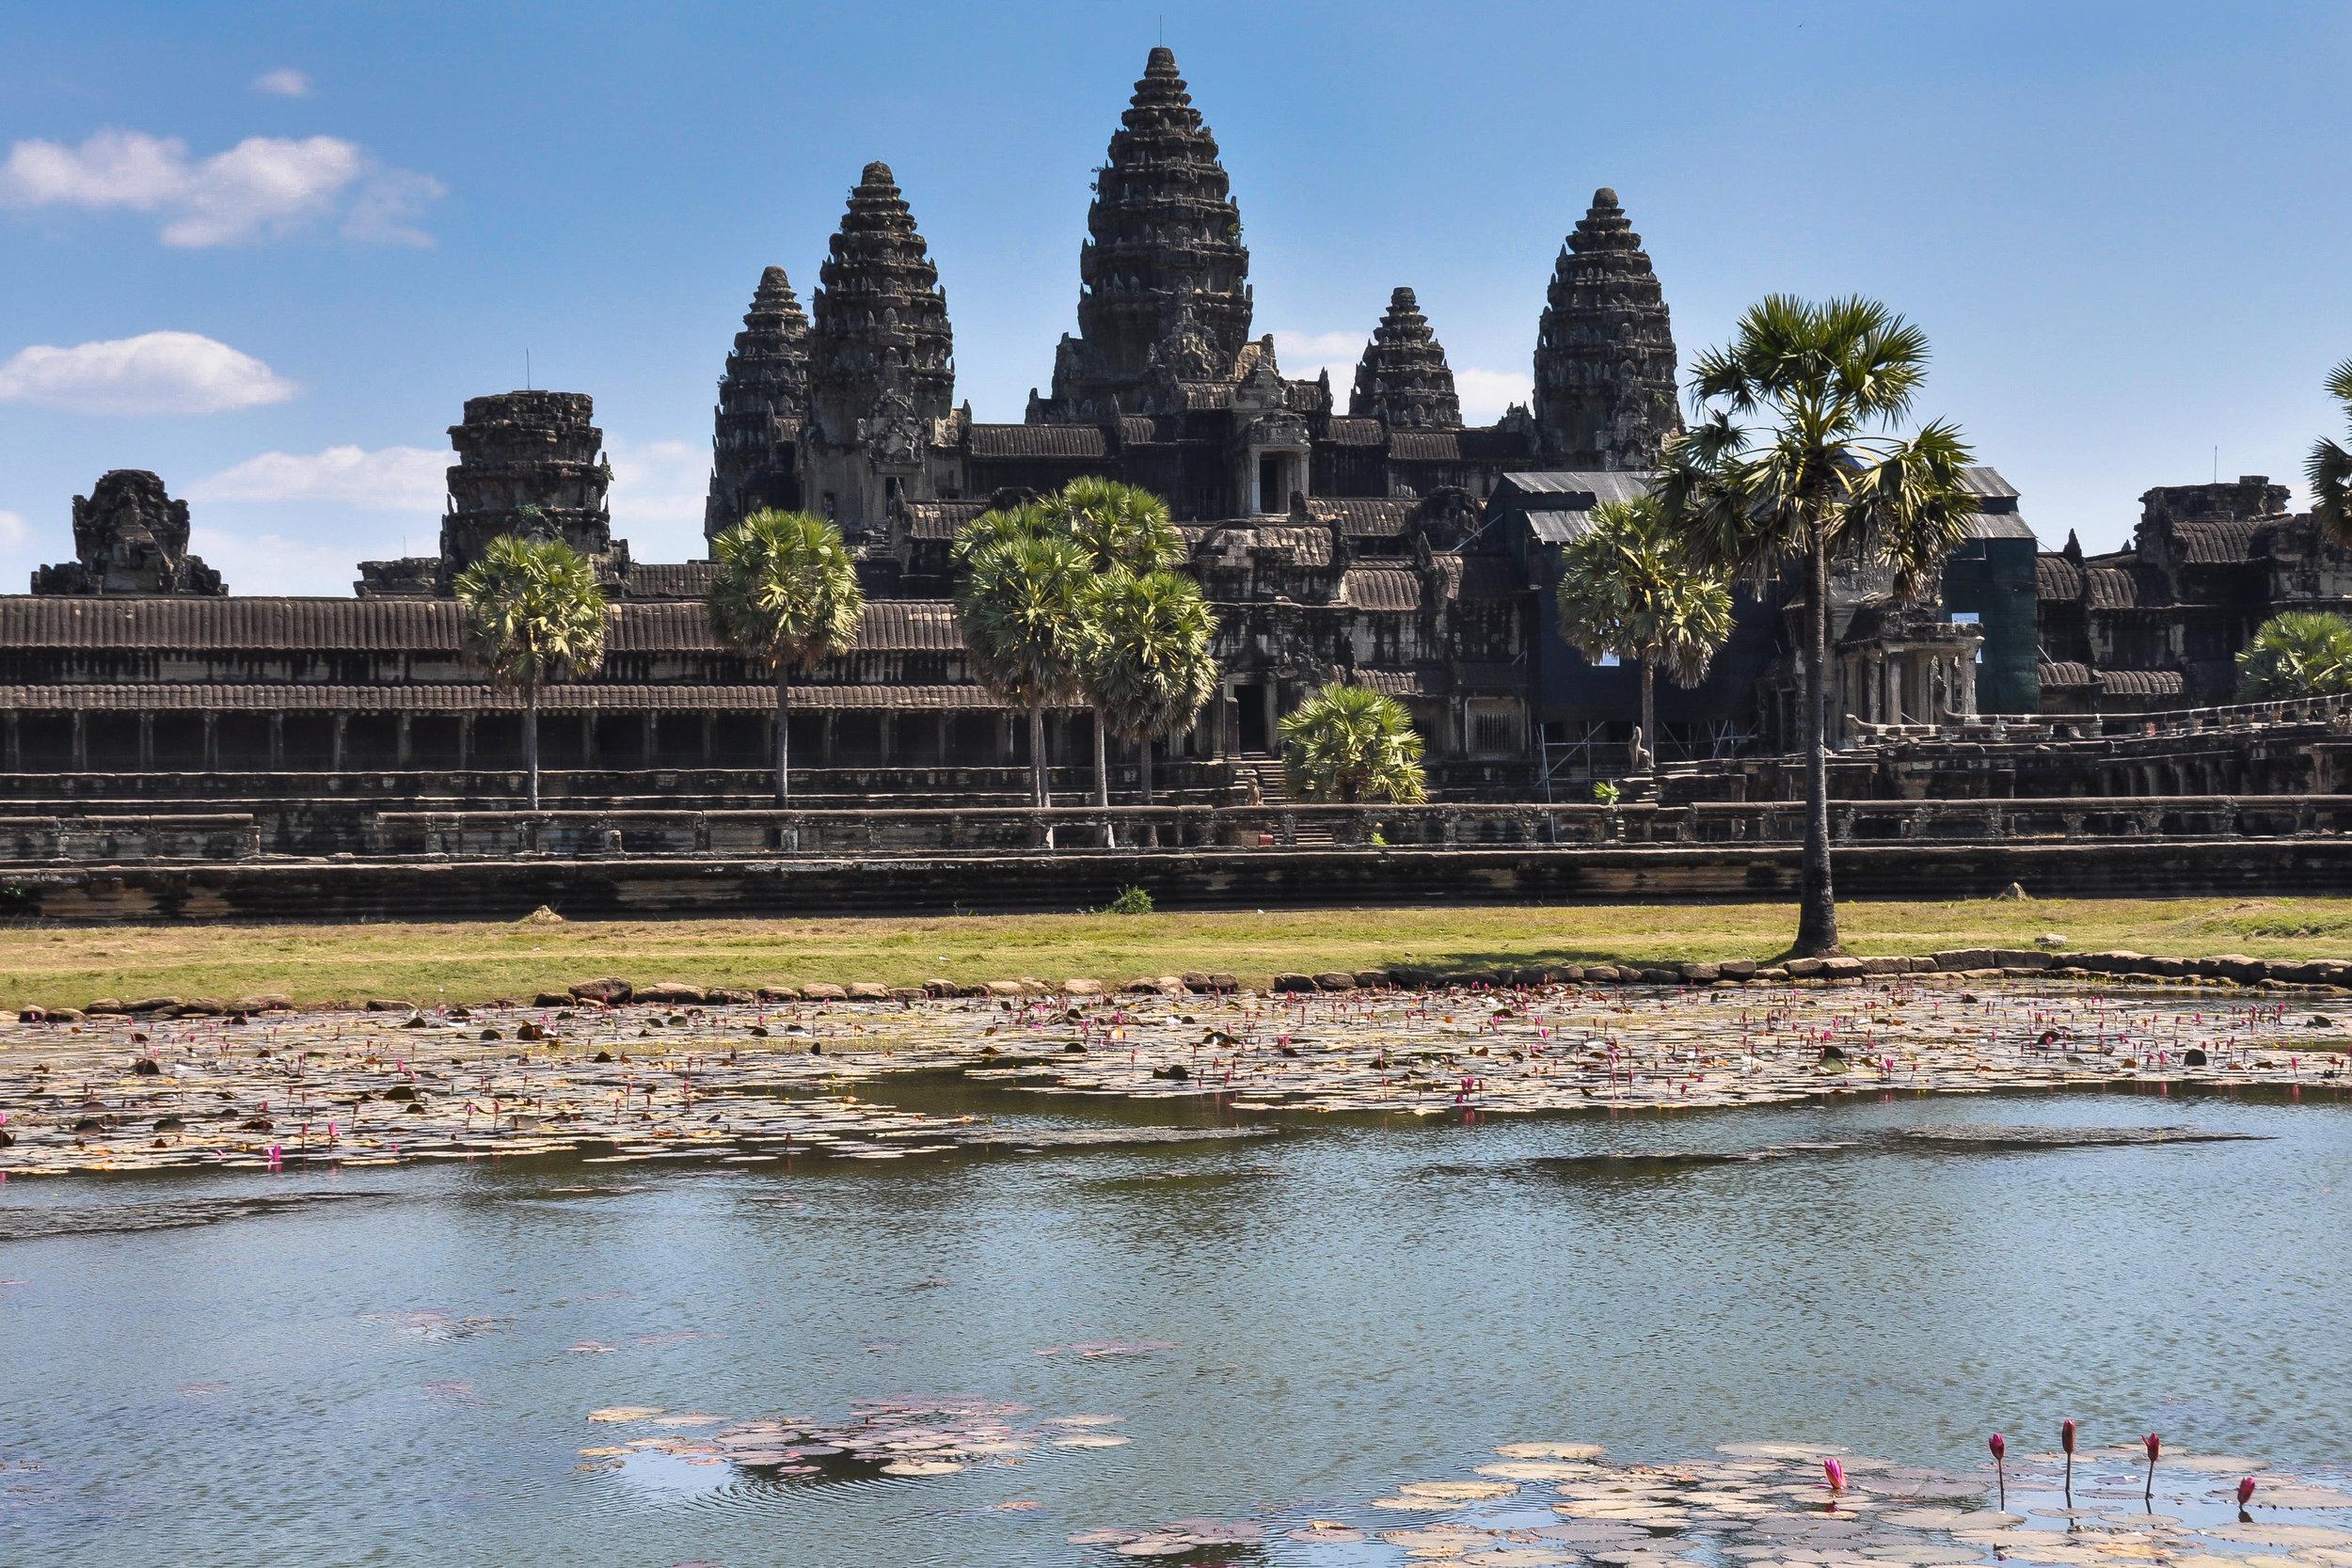 The Temple City - Angkor Wat (Cambodia)